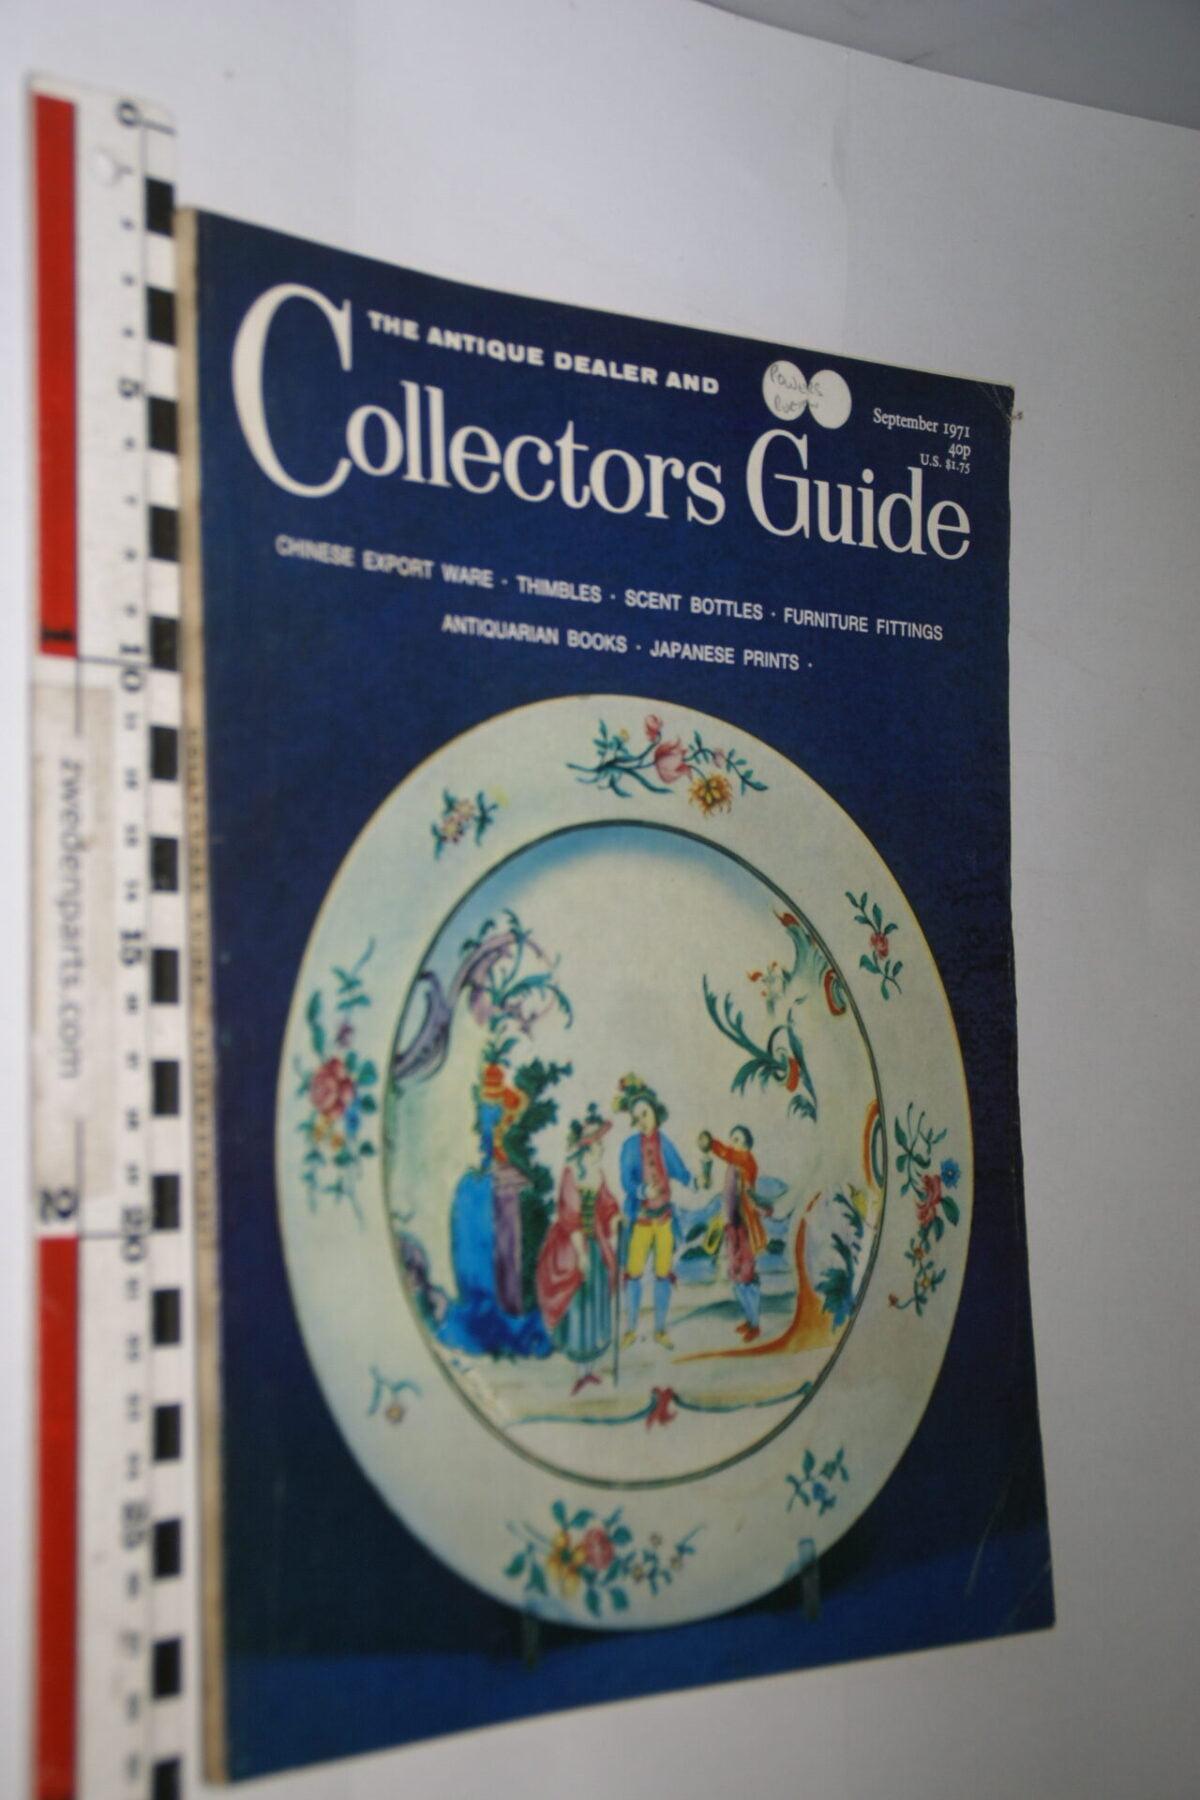 DSC06252 1971 september tijdschrift Antique Collectors Guide, English-f72b96cf